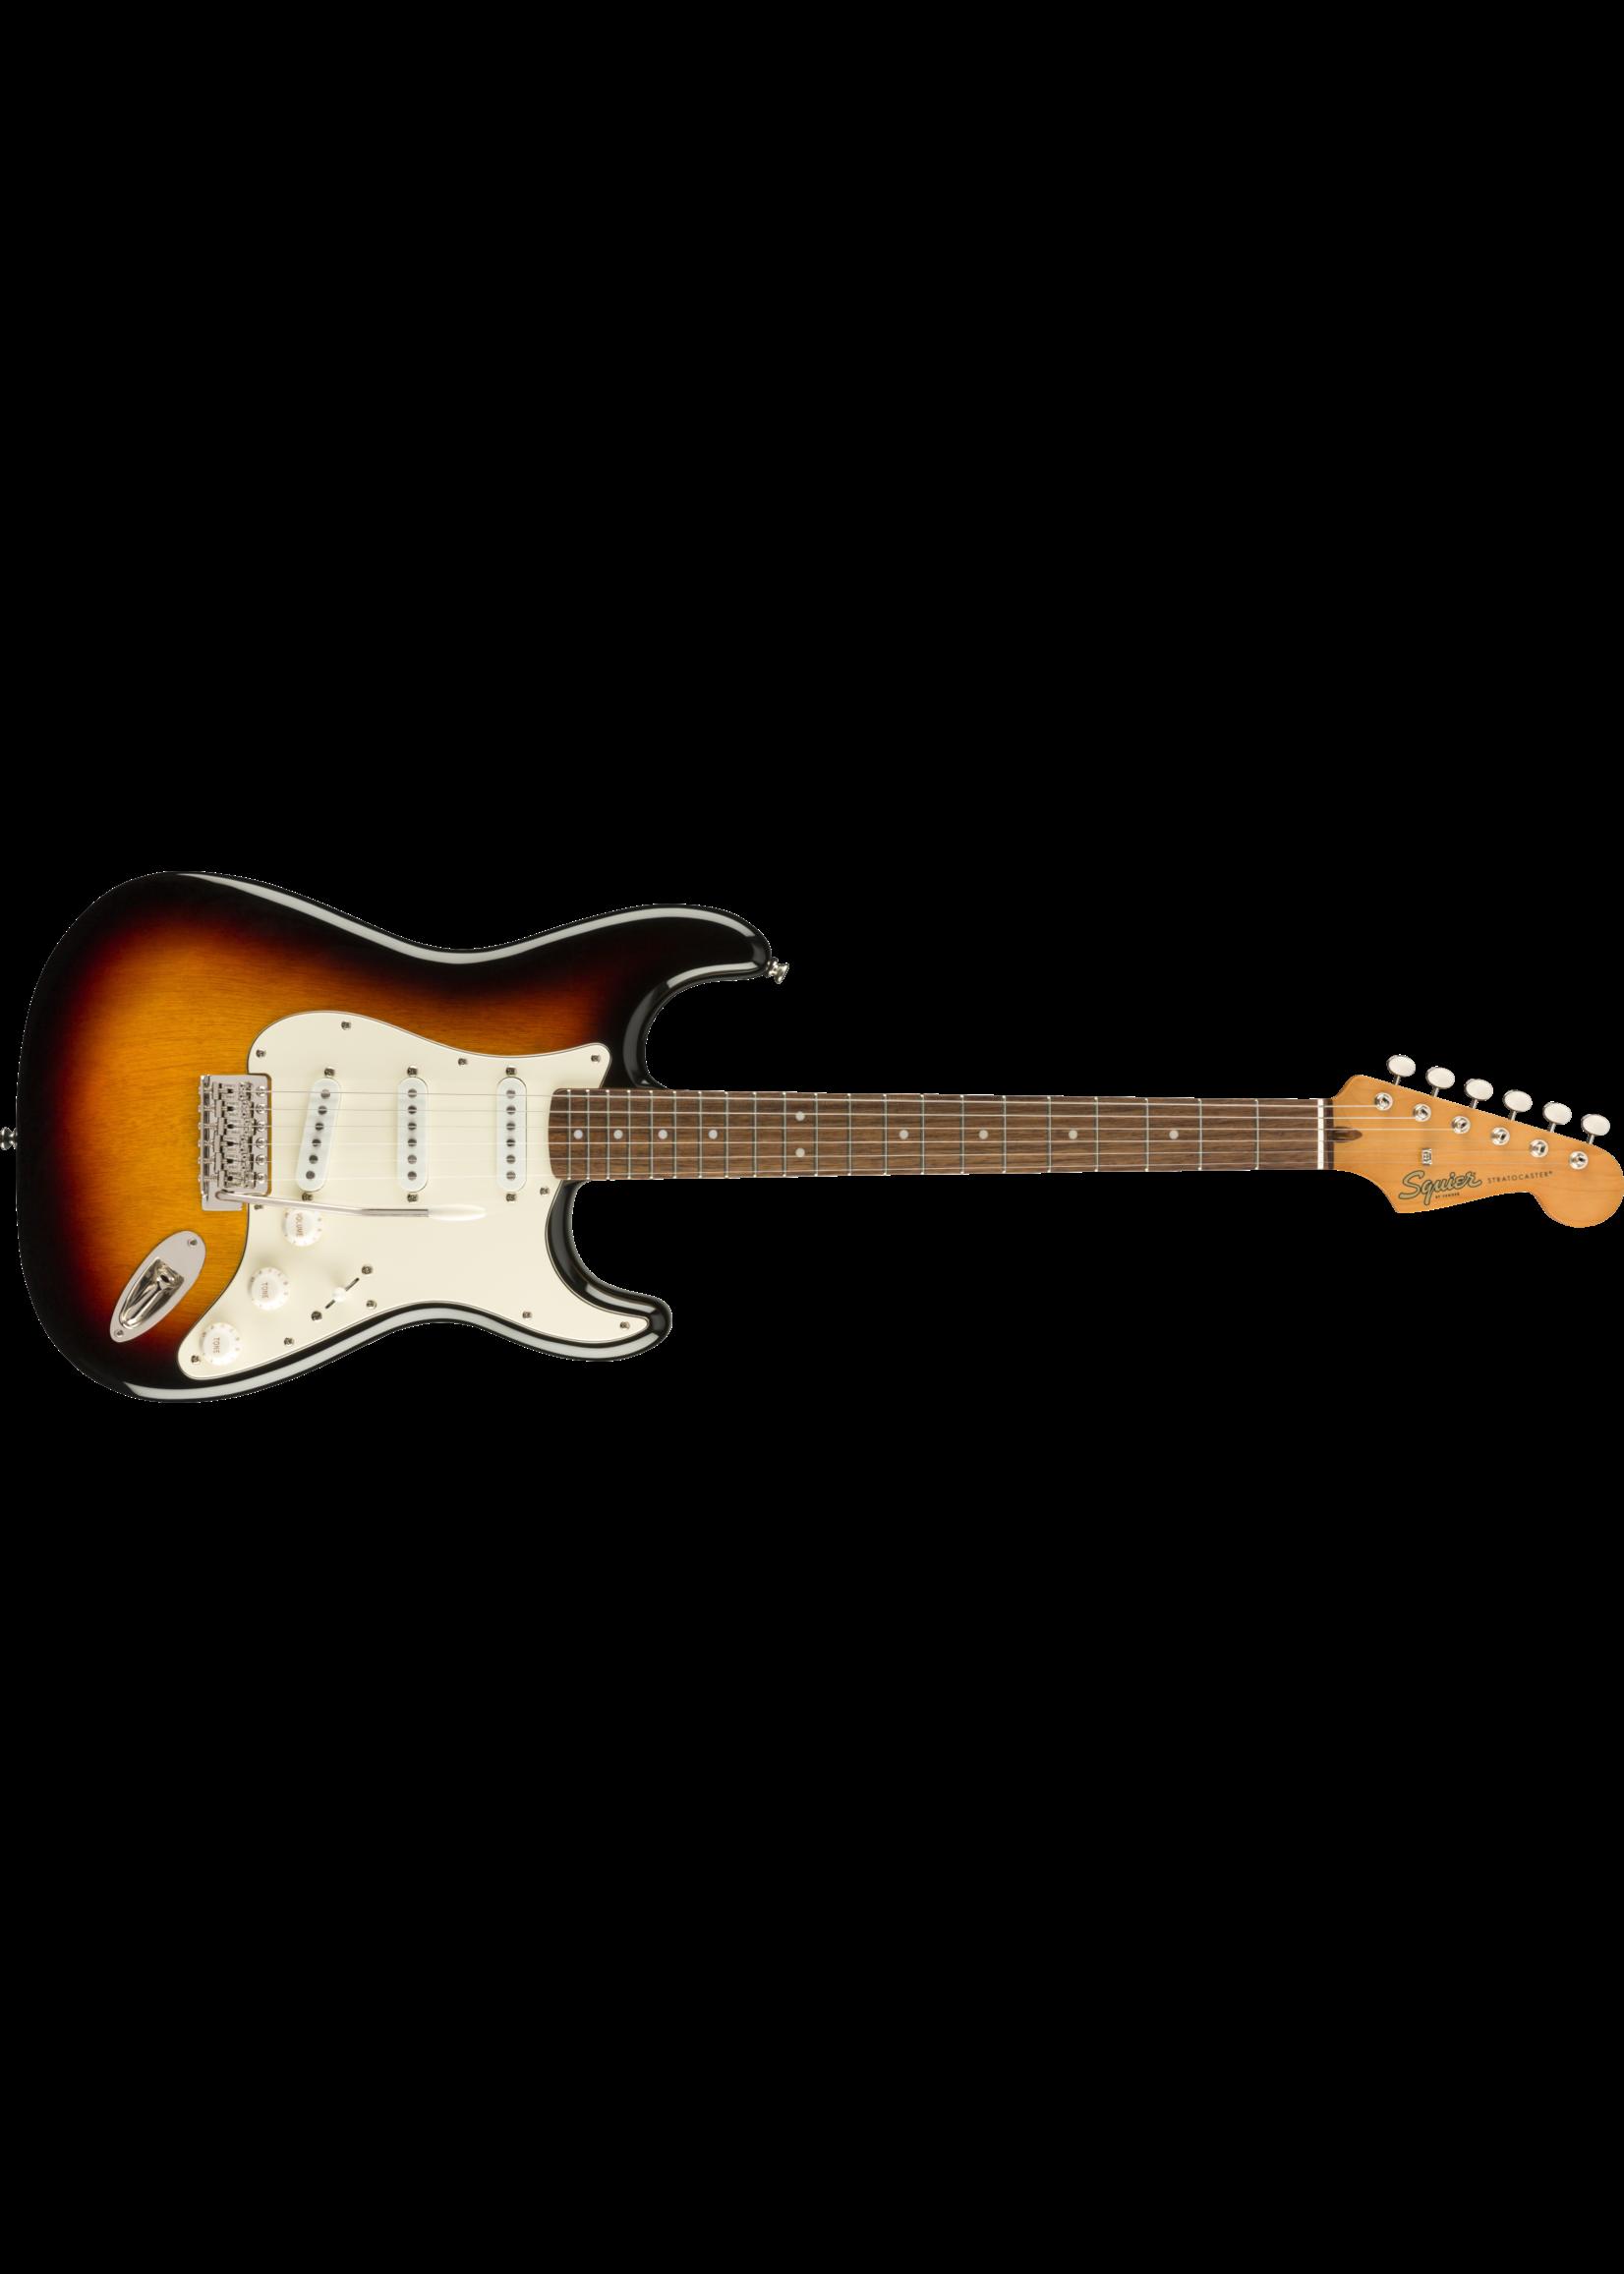 Squier Squier Classic Vibe '60s Stratocaster LRL Laurel Fingerboard Sunburst